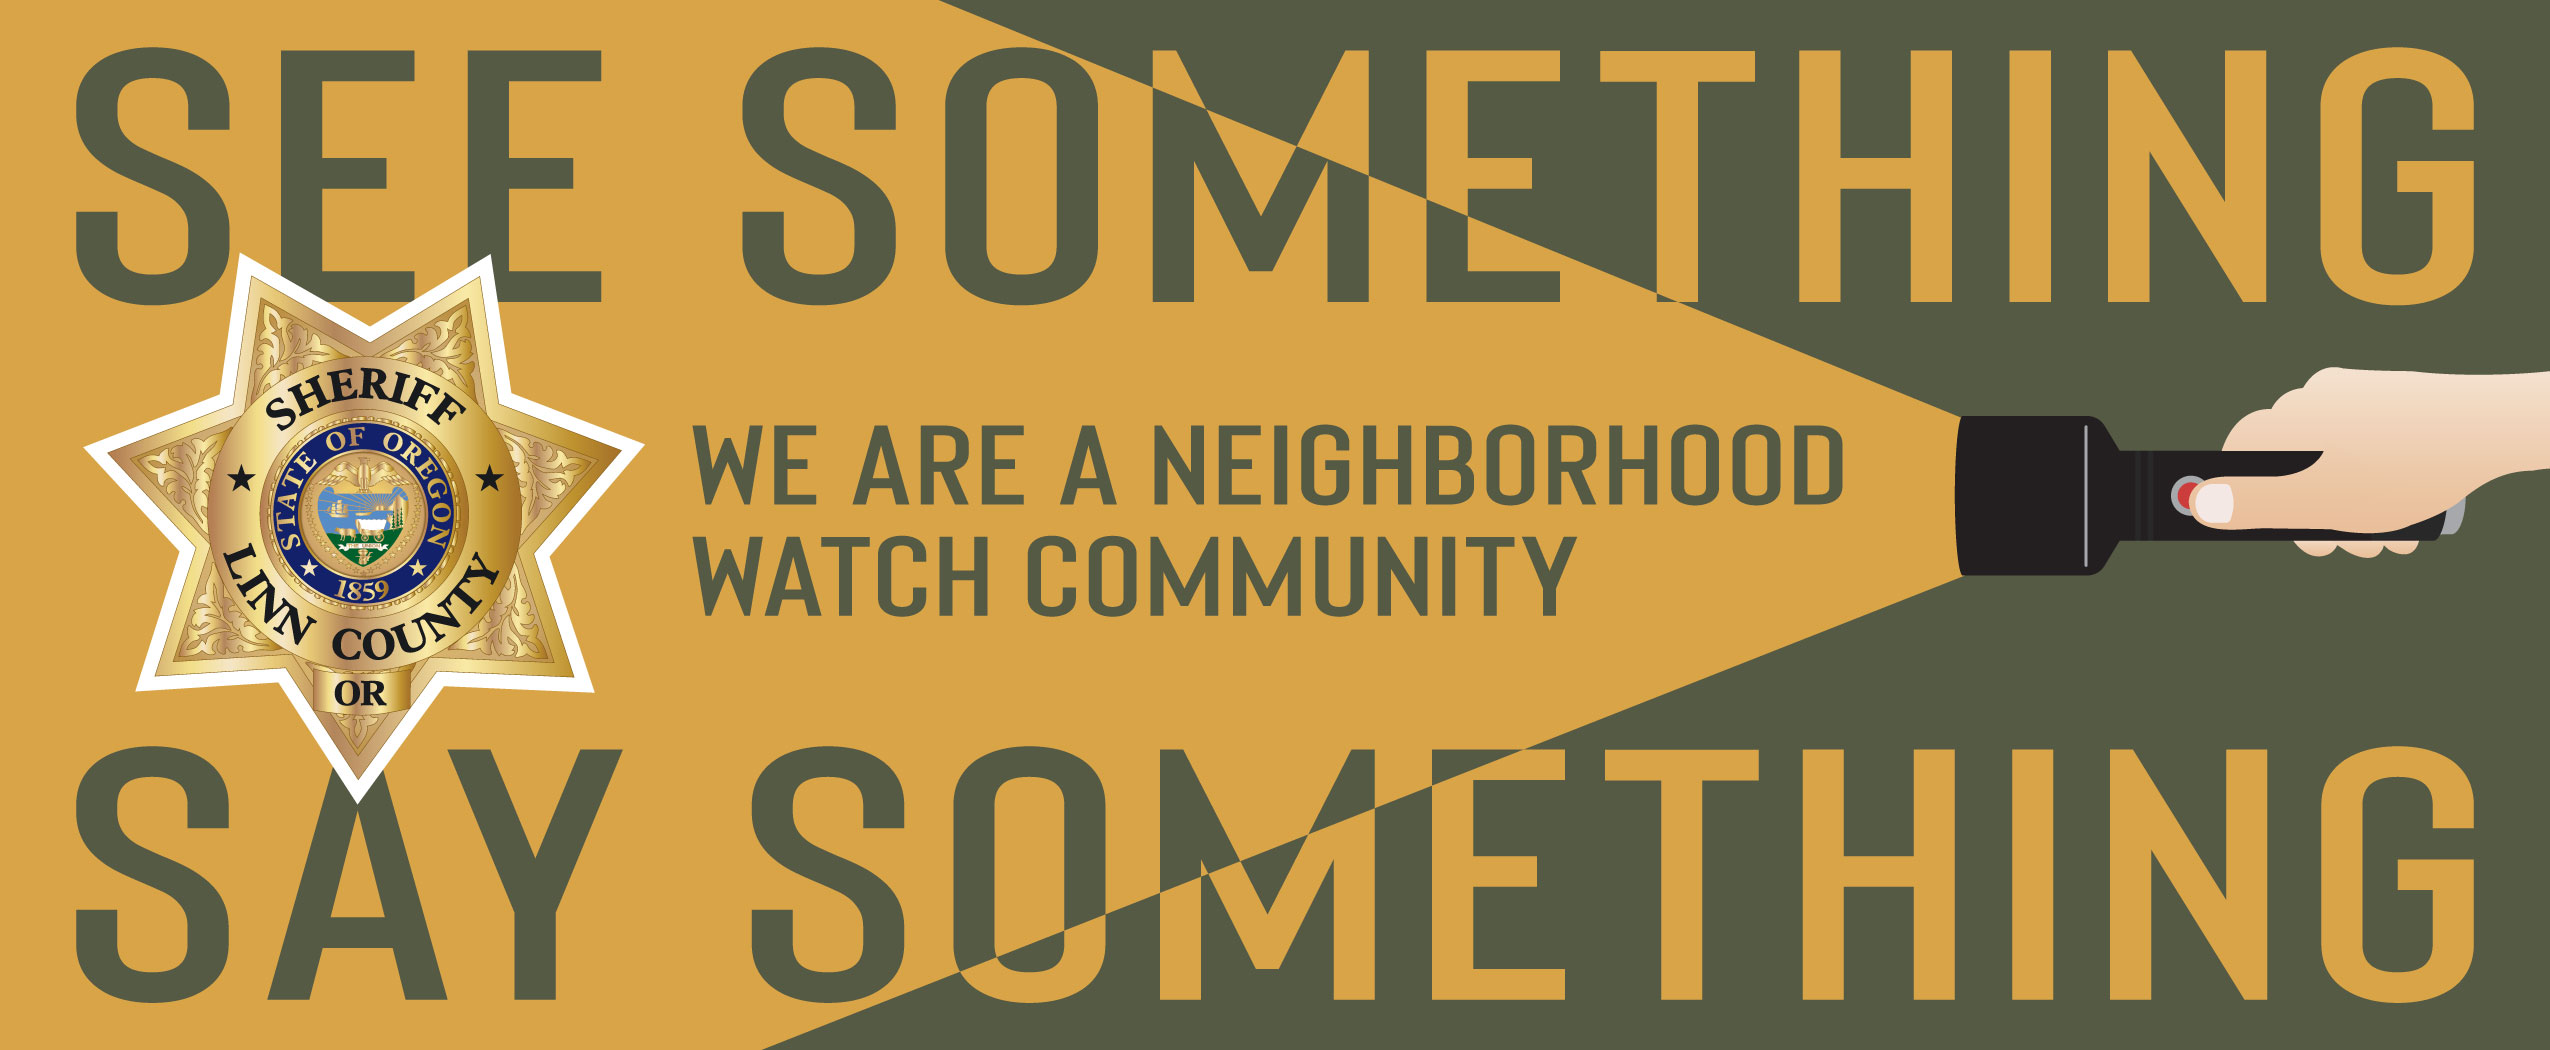 NW Organizer's Guide | Organizing guide, Organization ...  |Neighborhood Watch Organization